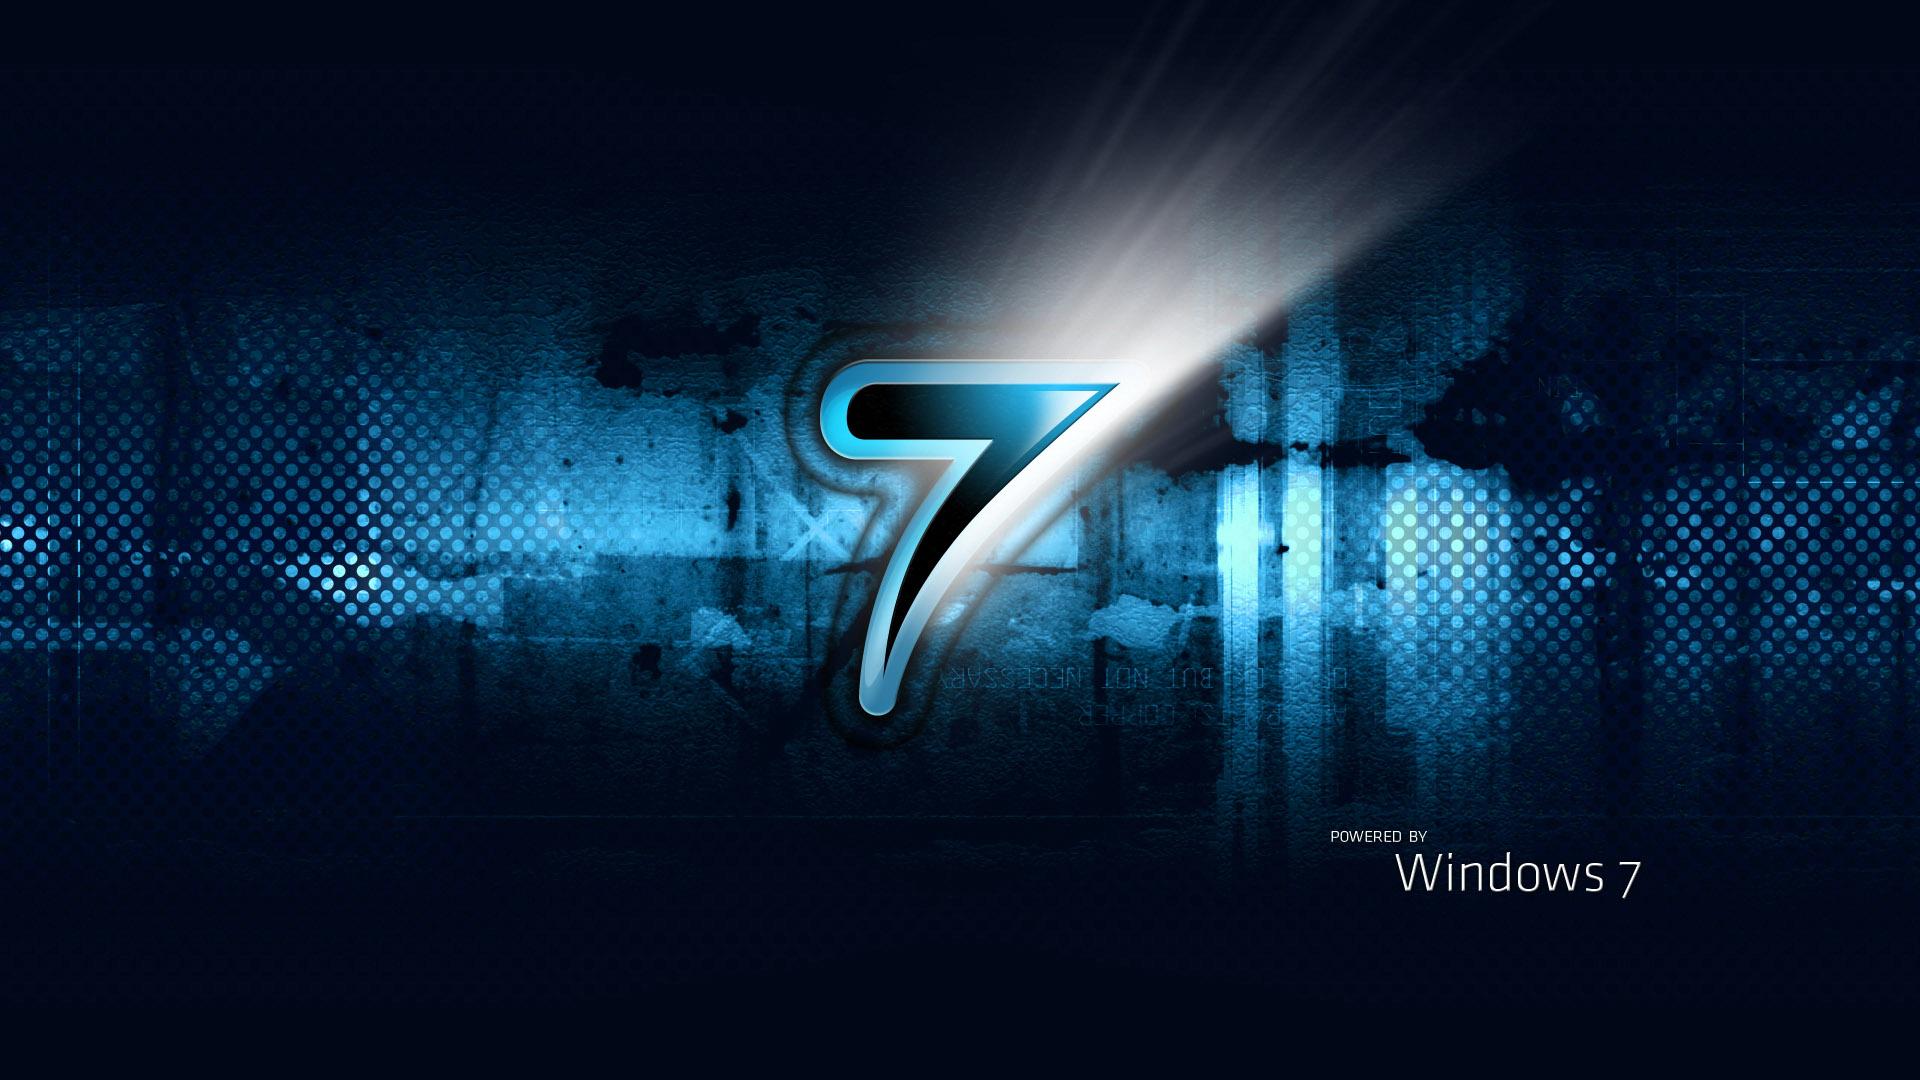 Windows 7 Dark Blue 1920x1080 HD Image Computers Windows 7 1920x1080